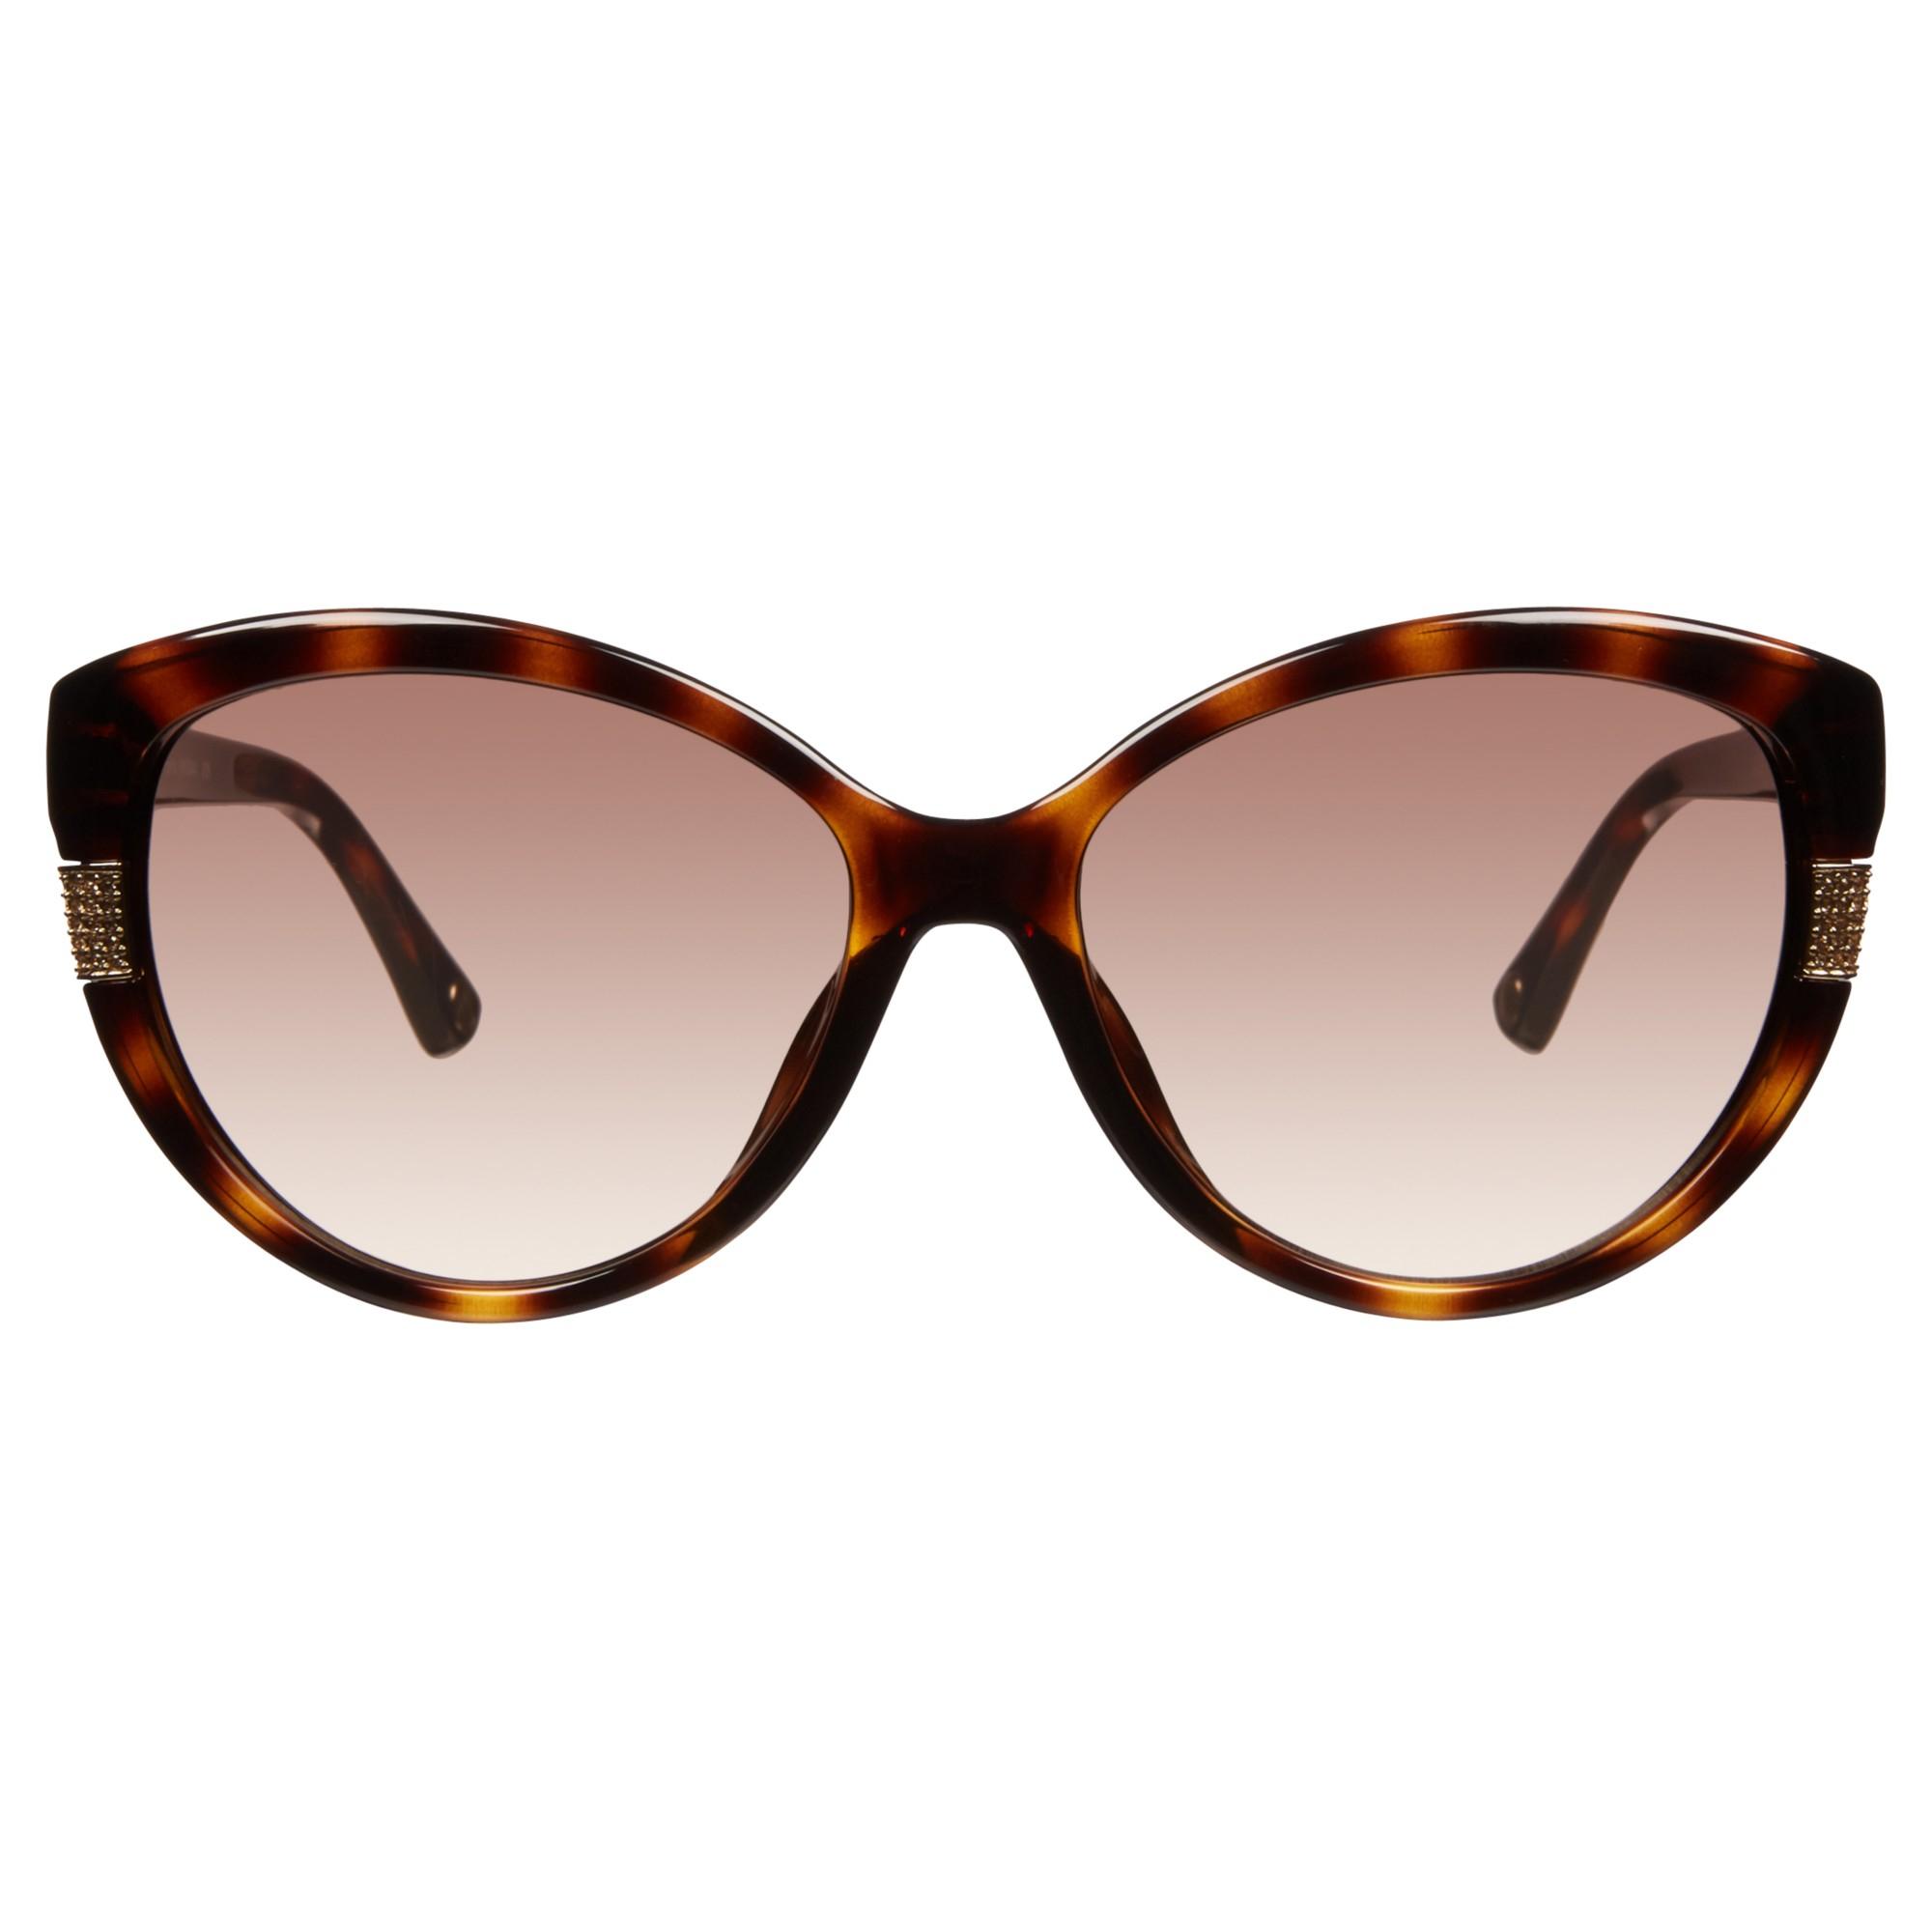 Michael Kors Mks844 Angelica Cat Eye Sunglasses in Tortoise (Metallic)